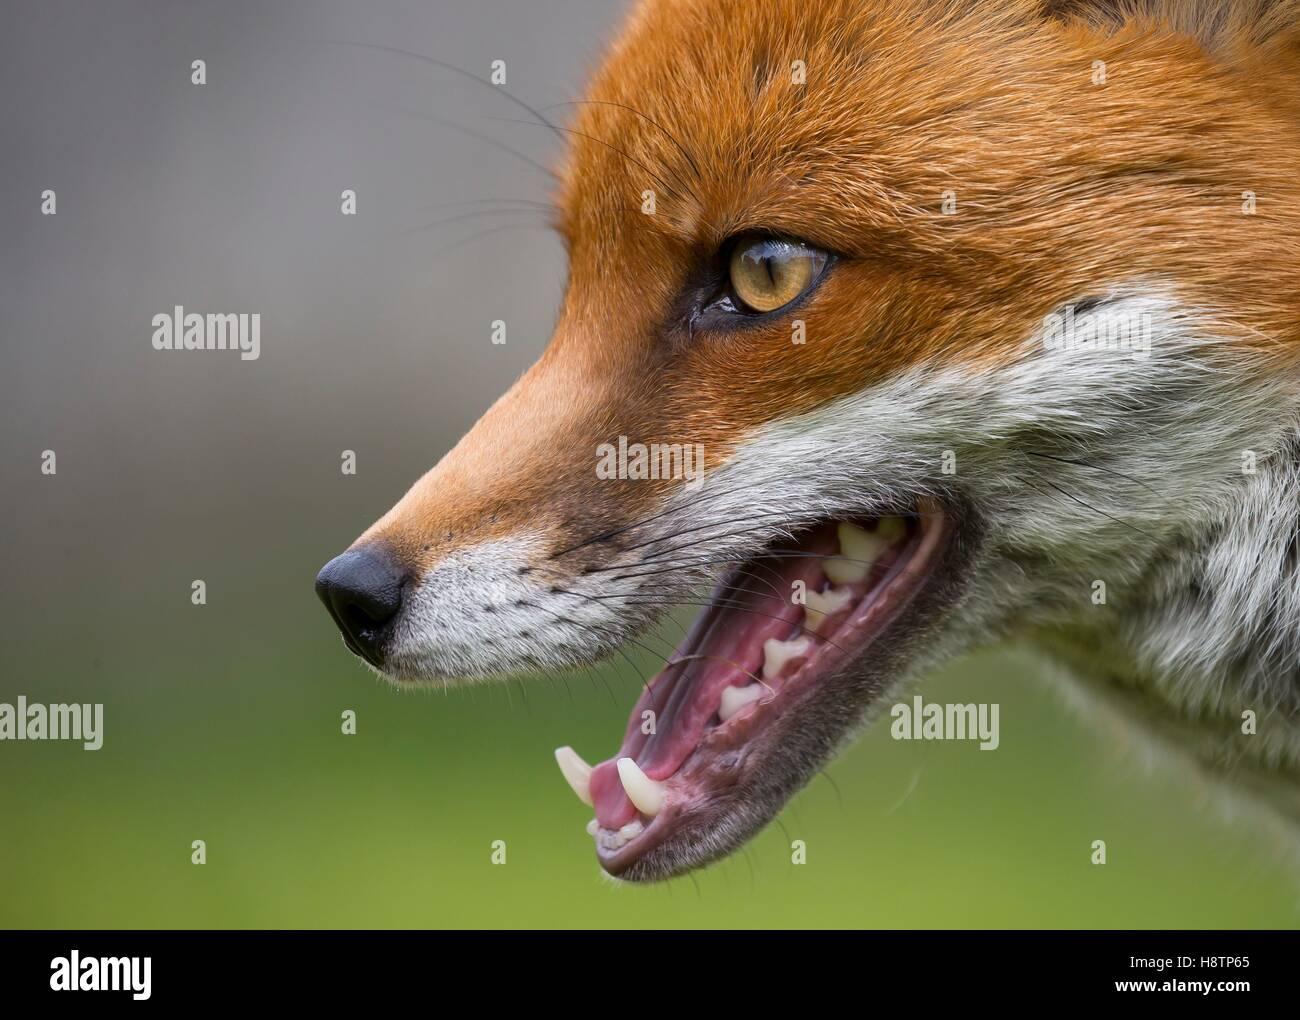 Red Fox Vulpes Vulpes Fox Head Details England Spring Stock Photo Alamy